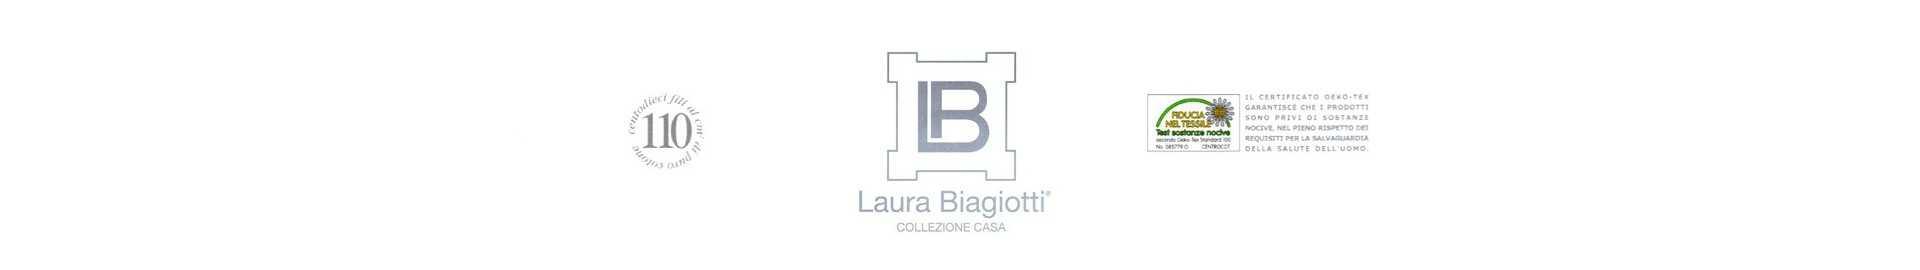 Rasoline L.F.D. Home -Laura Biagiotti Alles zu Bettwaesche Shop Made in Italy !